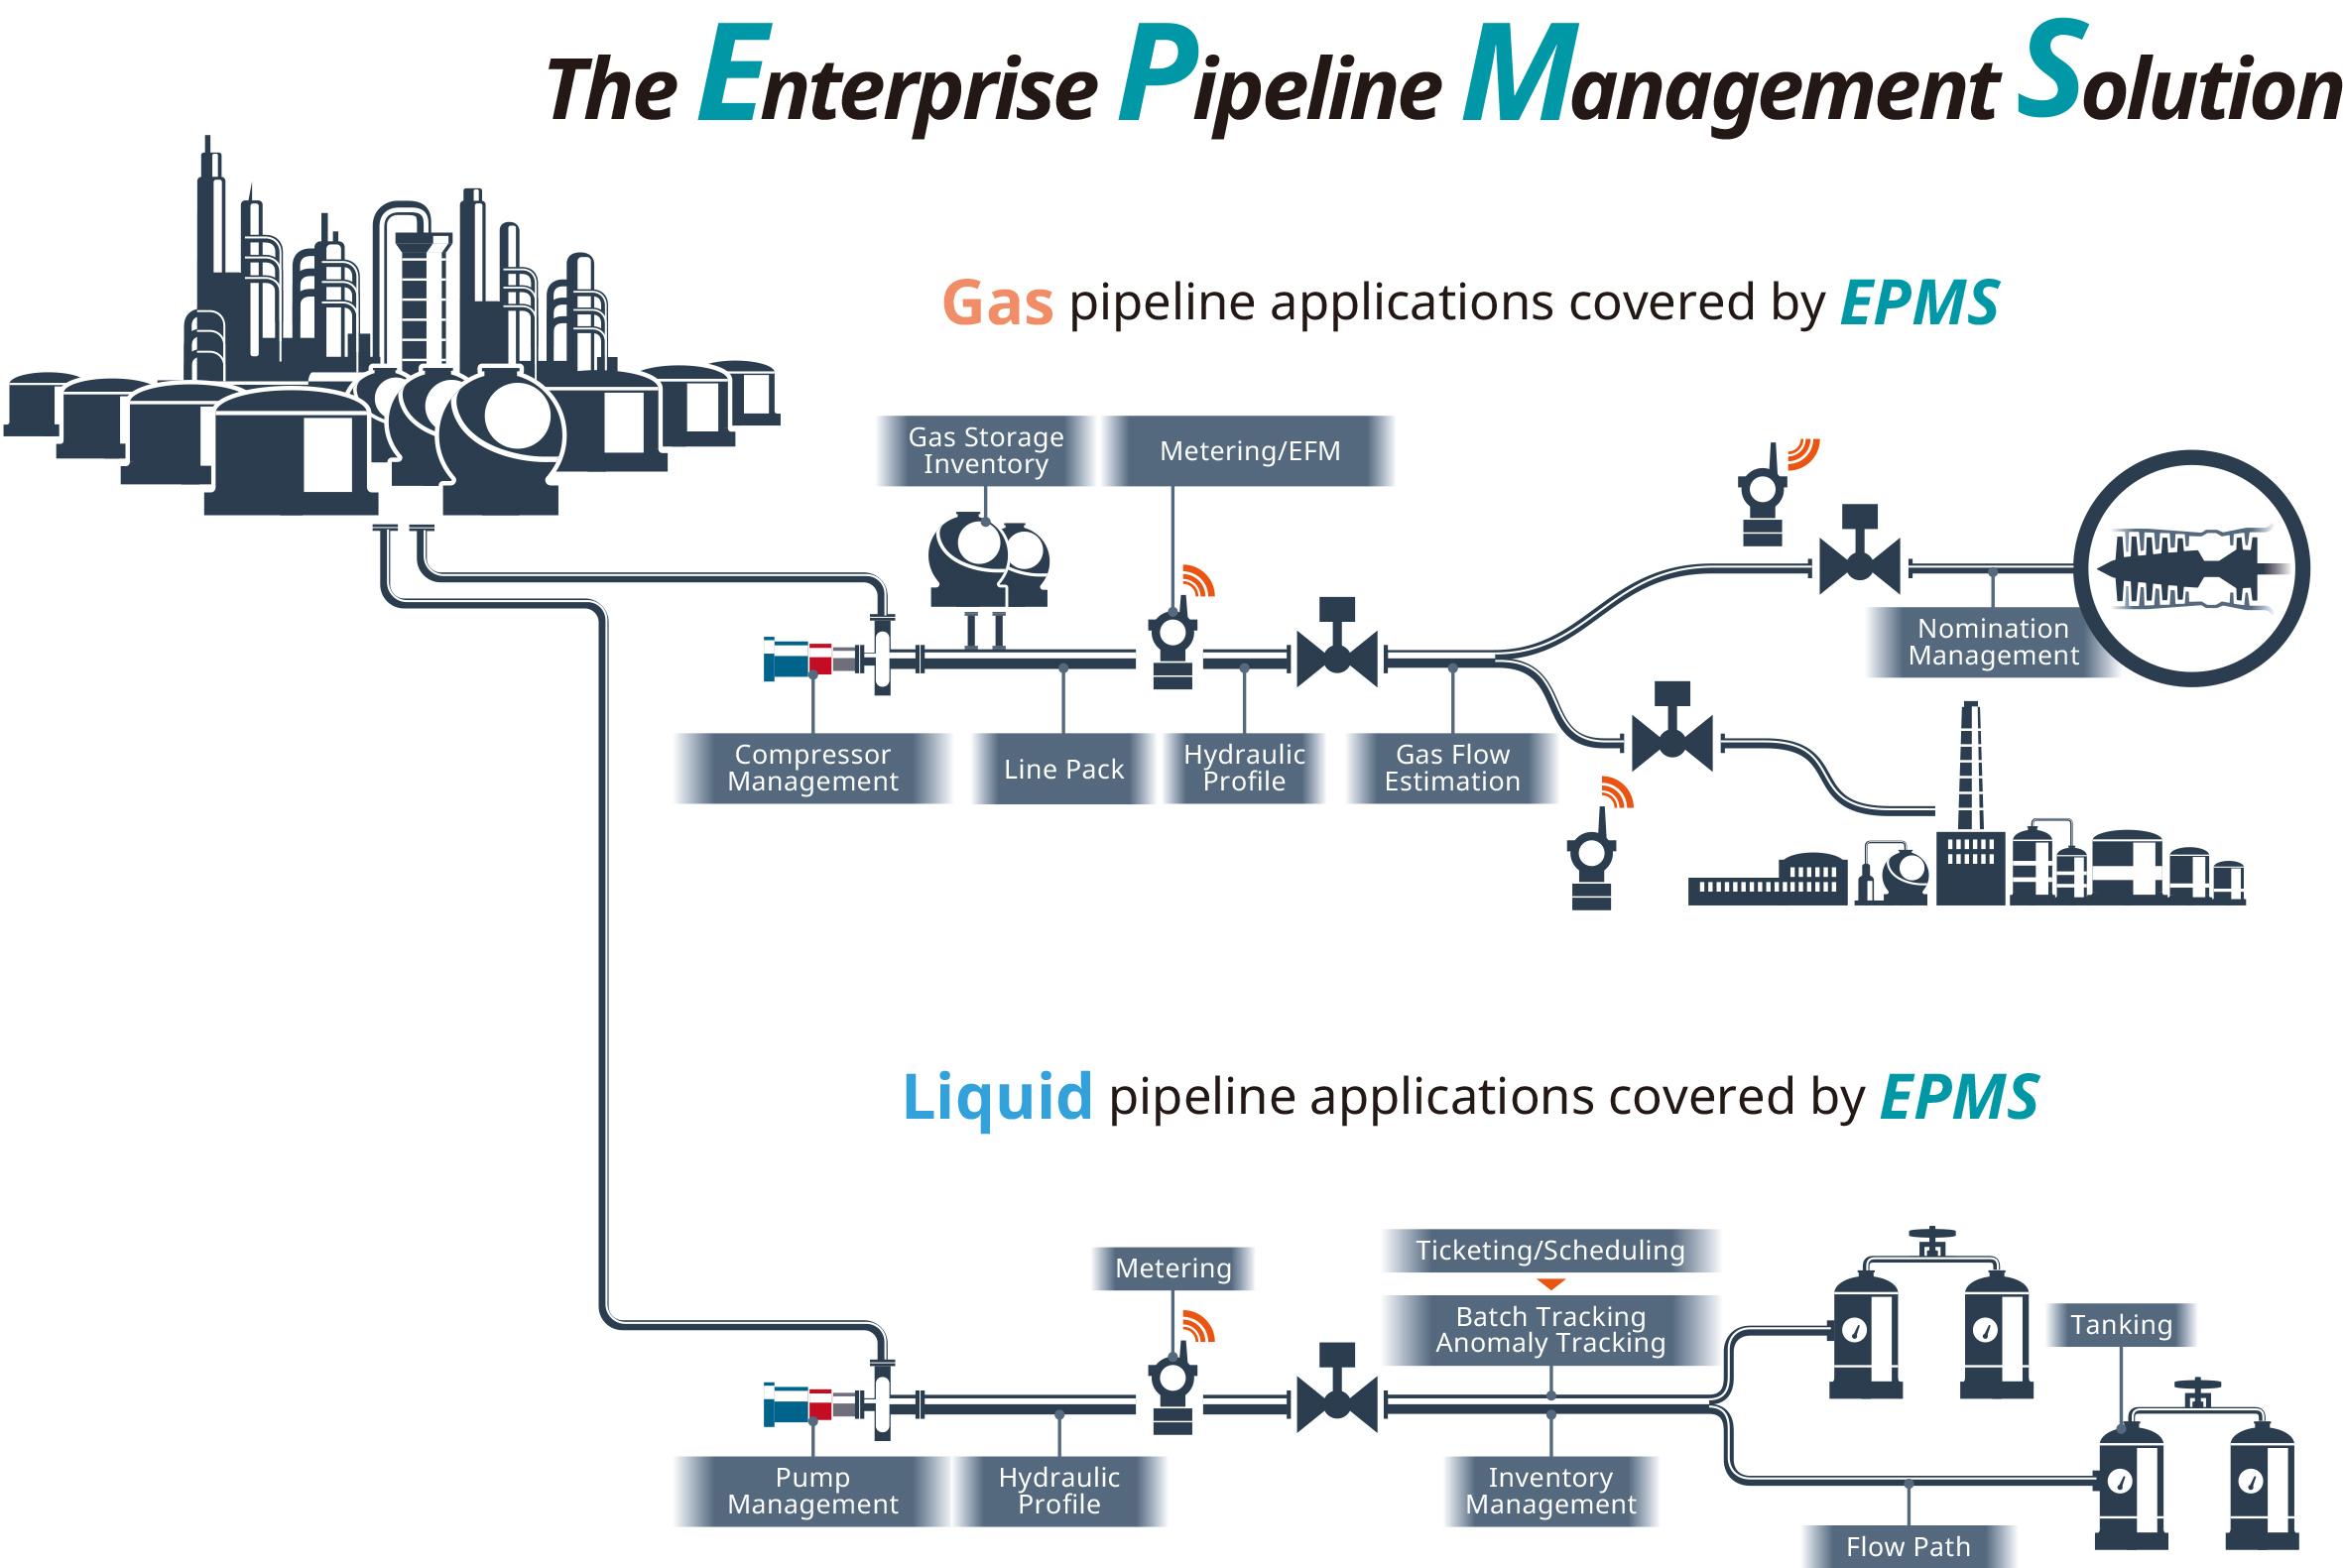 Pipeline Figure Wireless Power Transmission Market Detailed